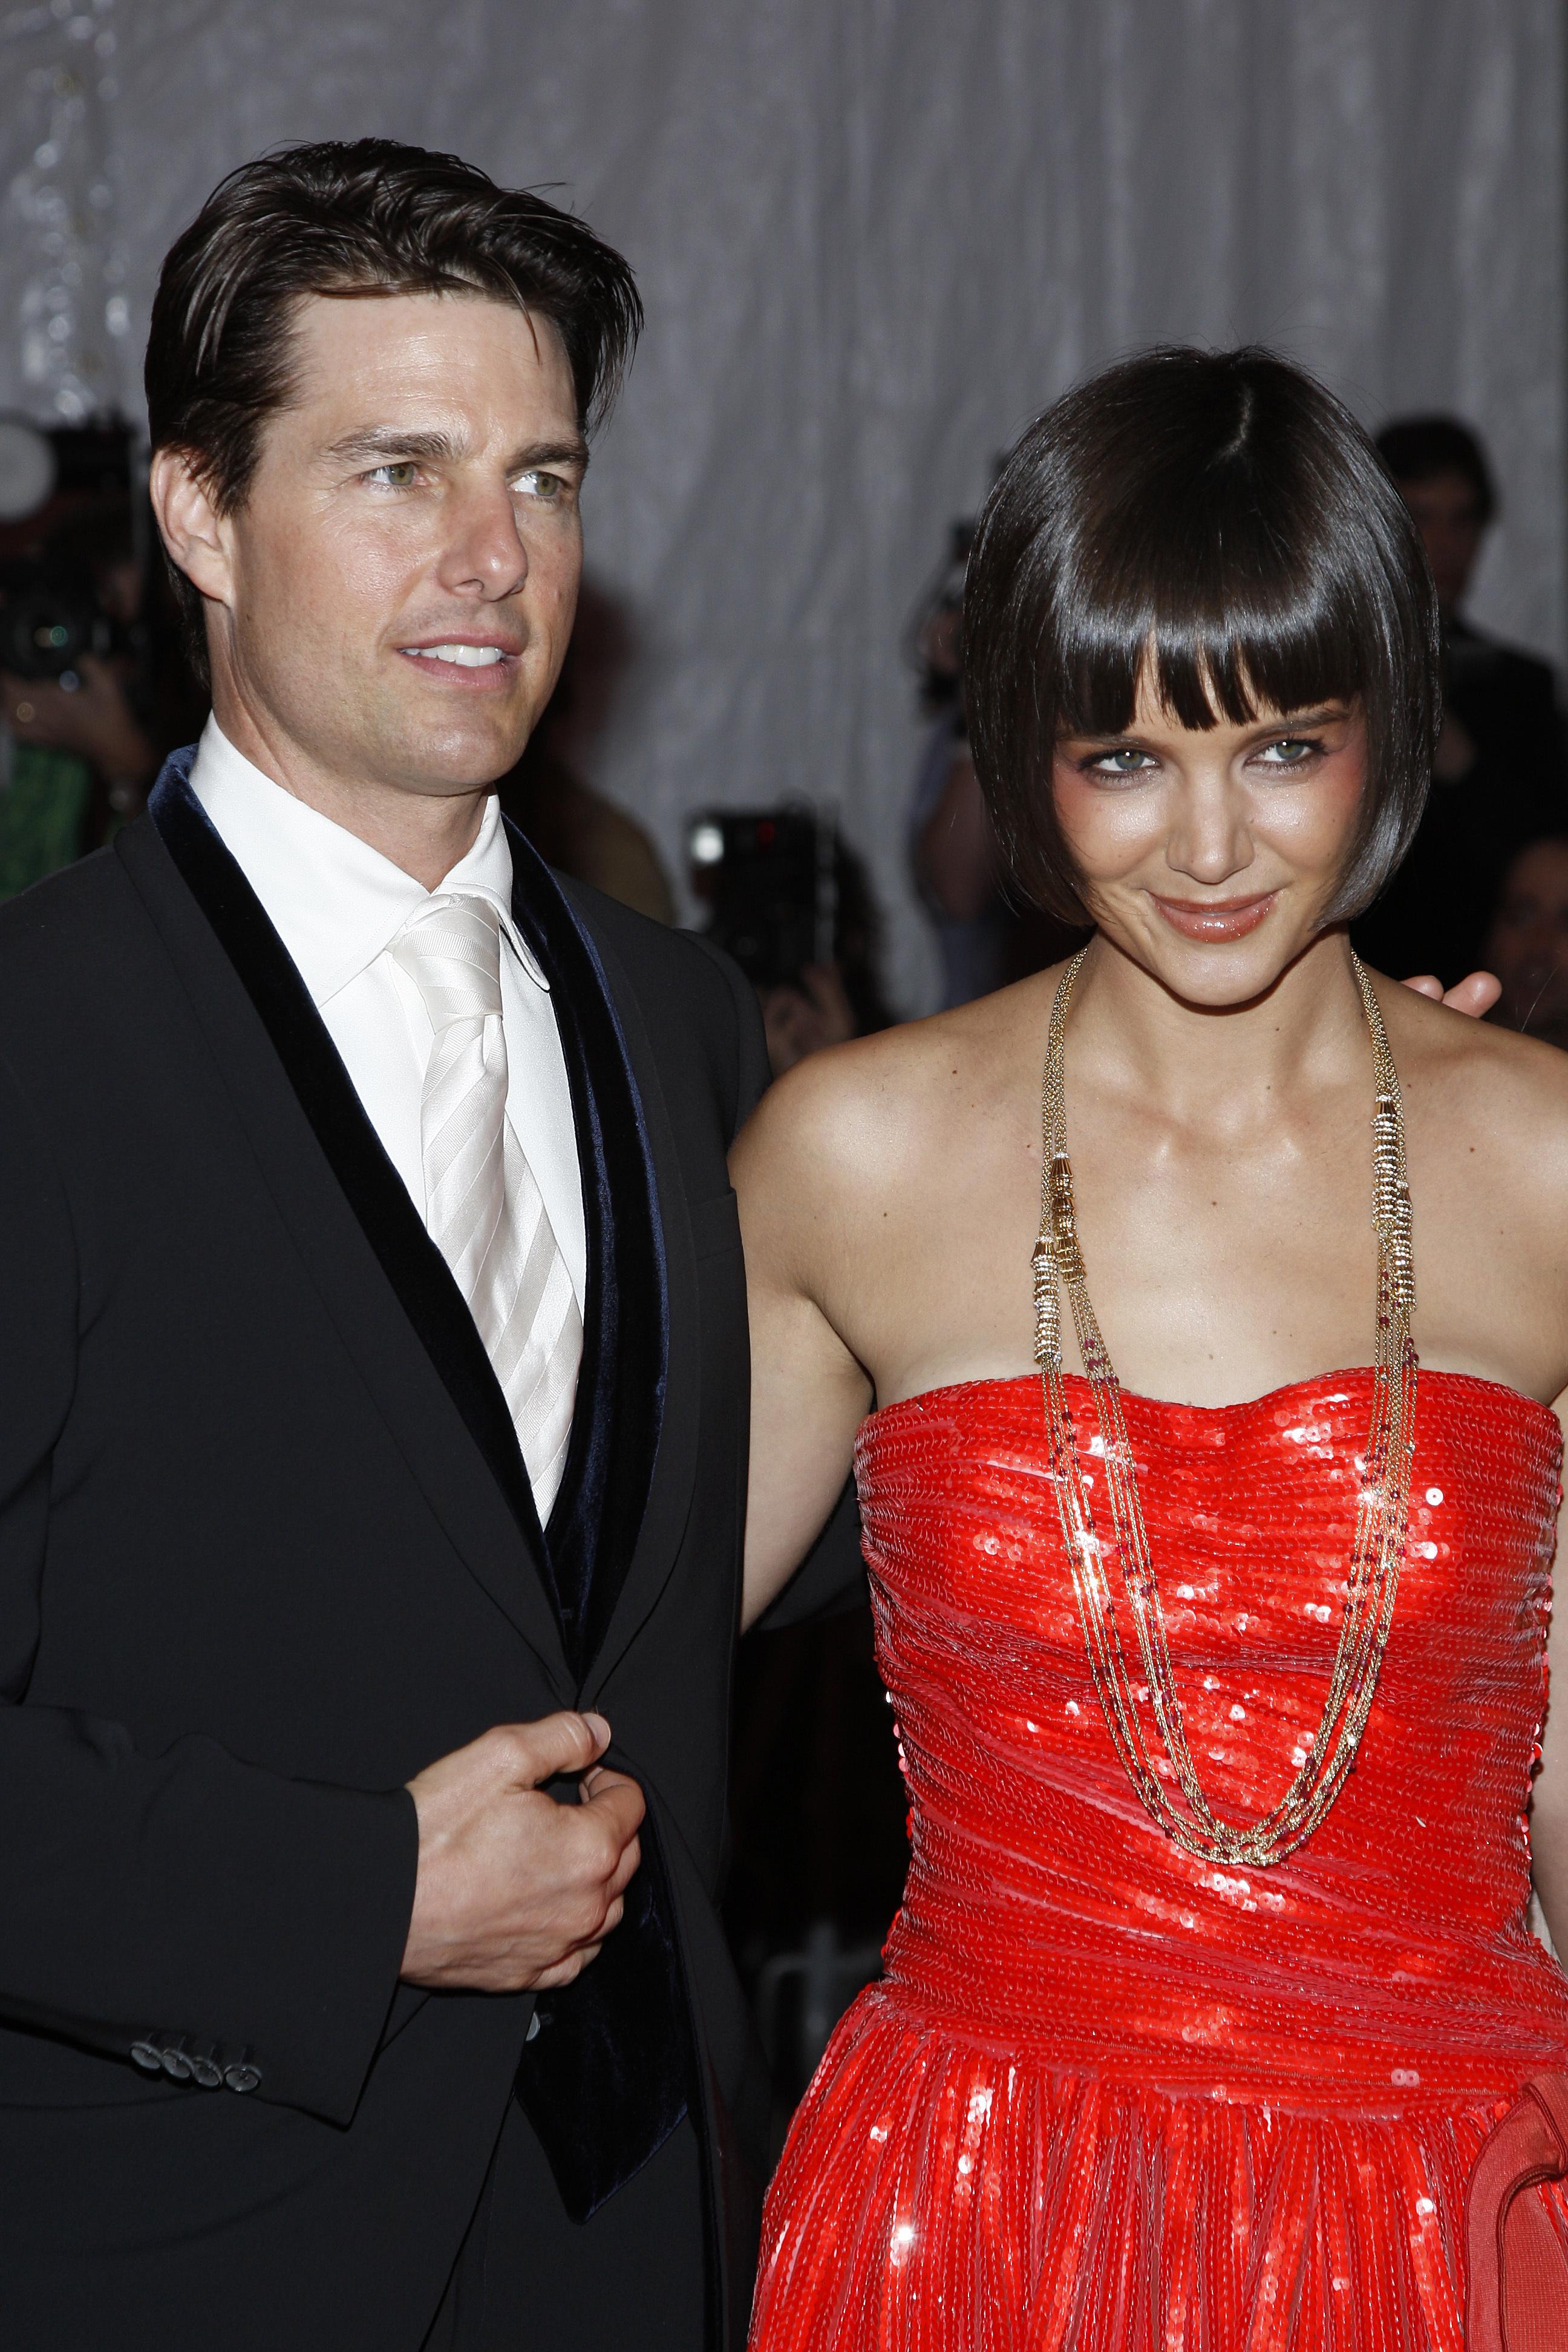 MetGalaRD_0023320.jpg Tom Cruise and Katie Holmes